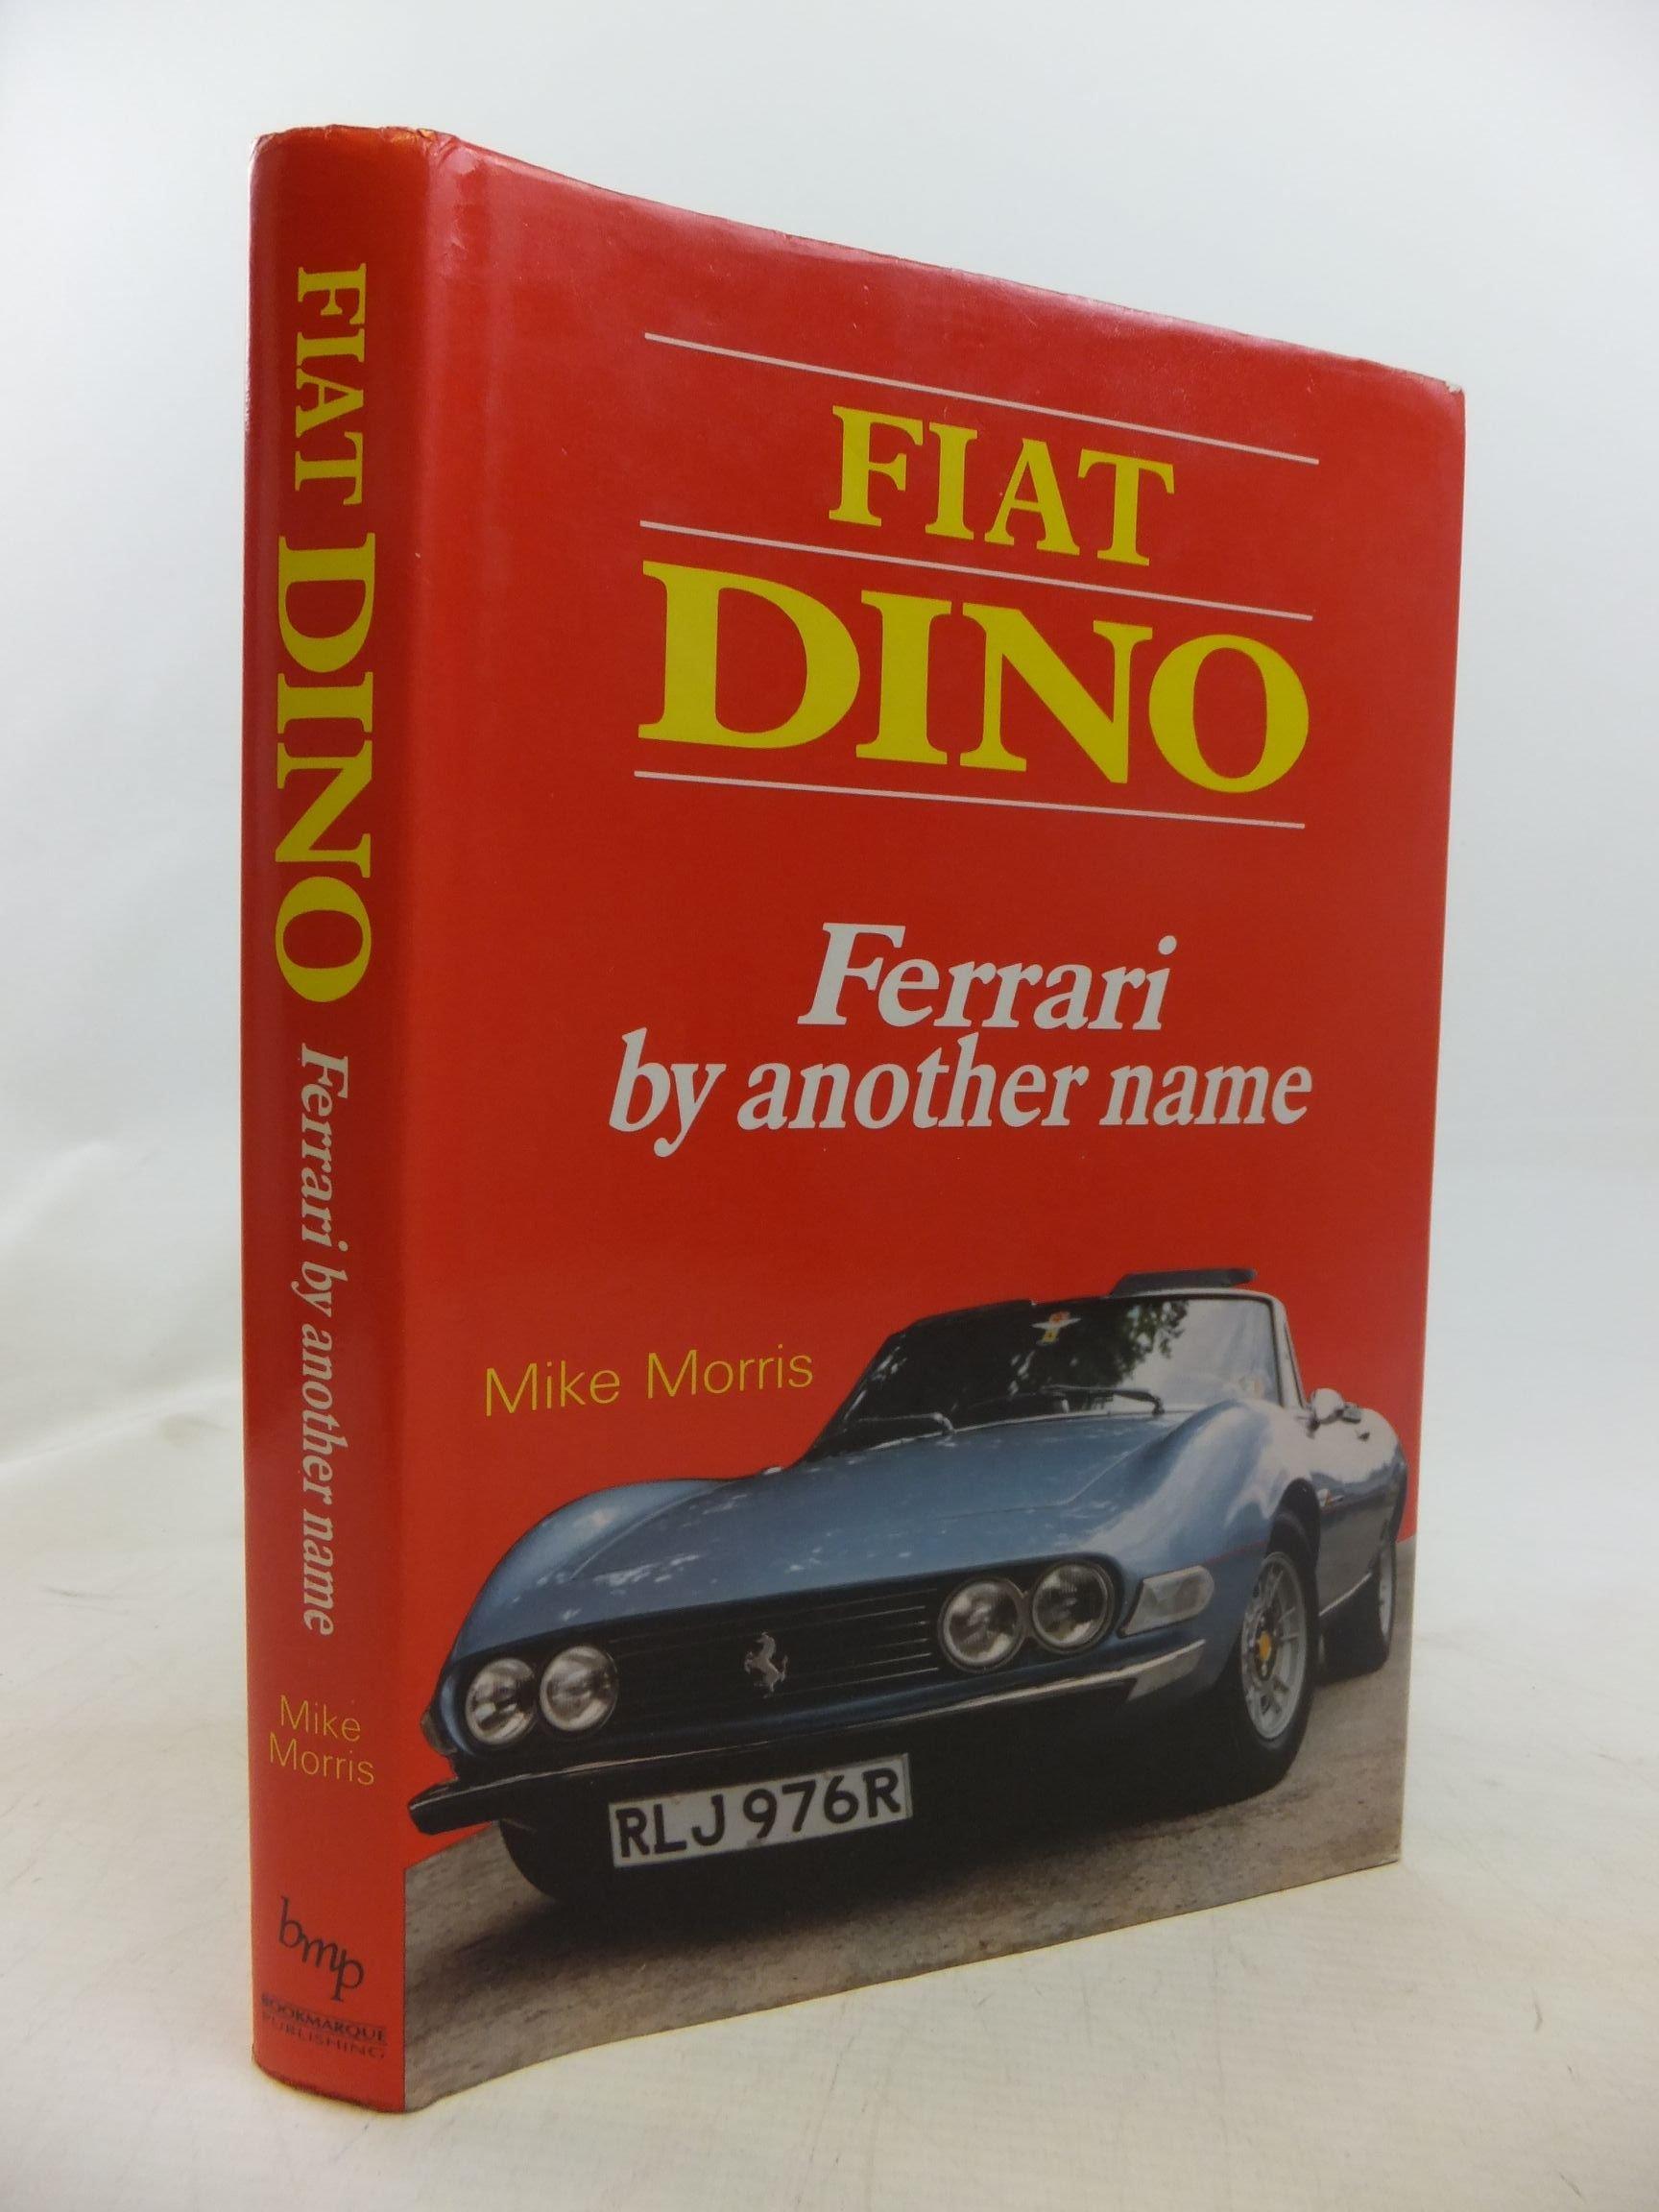 Fiat Dino Ferrari By Another Name: Mike Morris: 9781870519038: Amazon:  Books